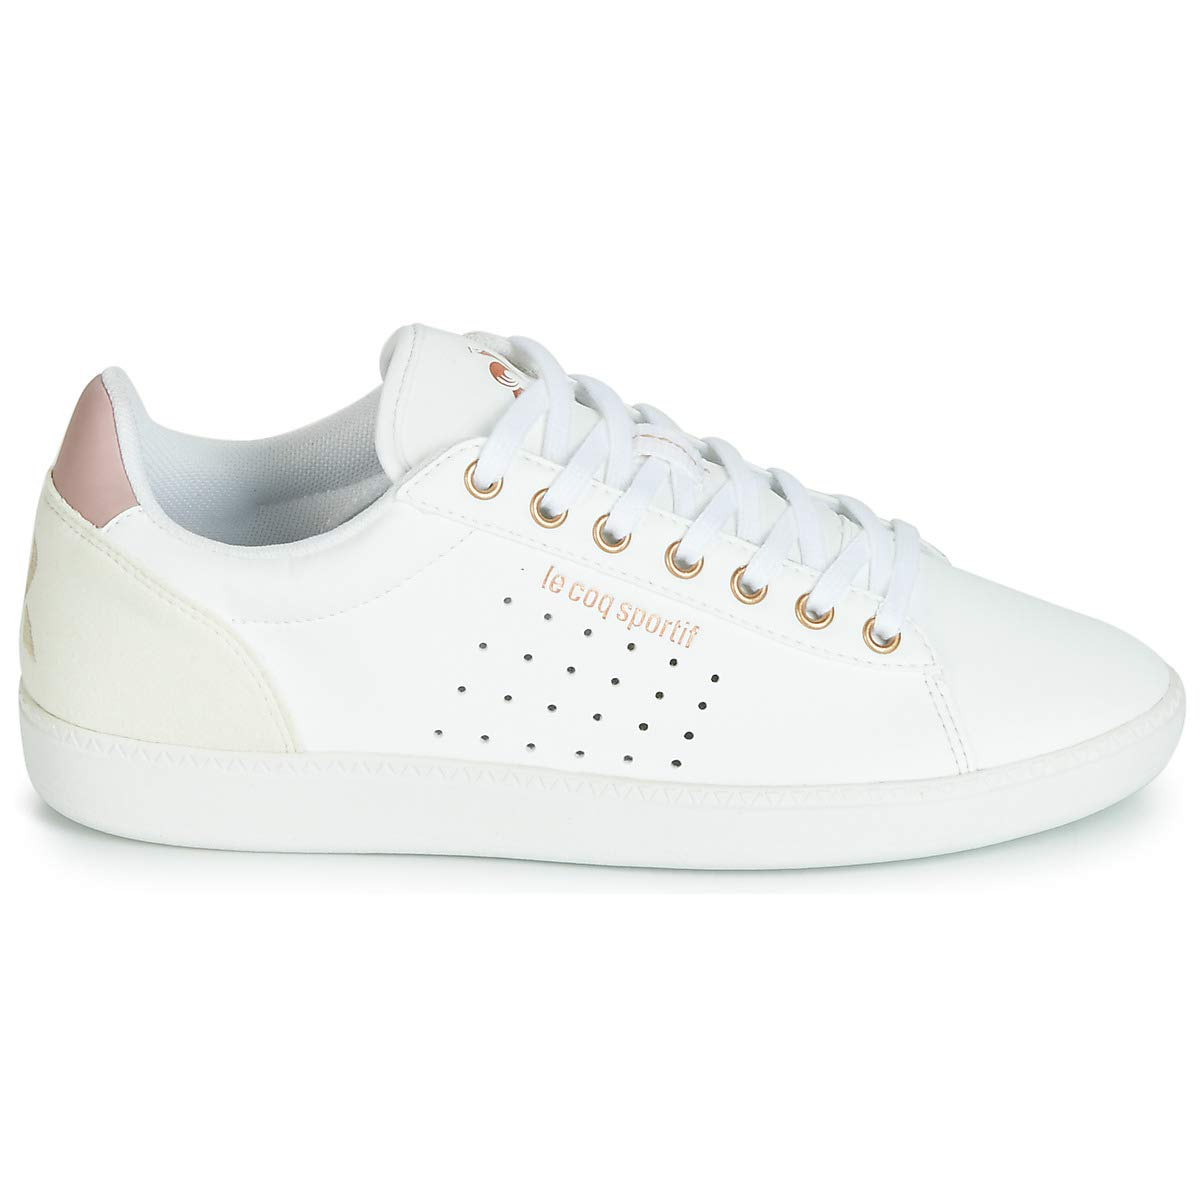 Le Coq Sportif Verdon Bold Sneaker Uomo 1910272 Optical White